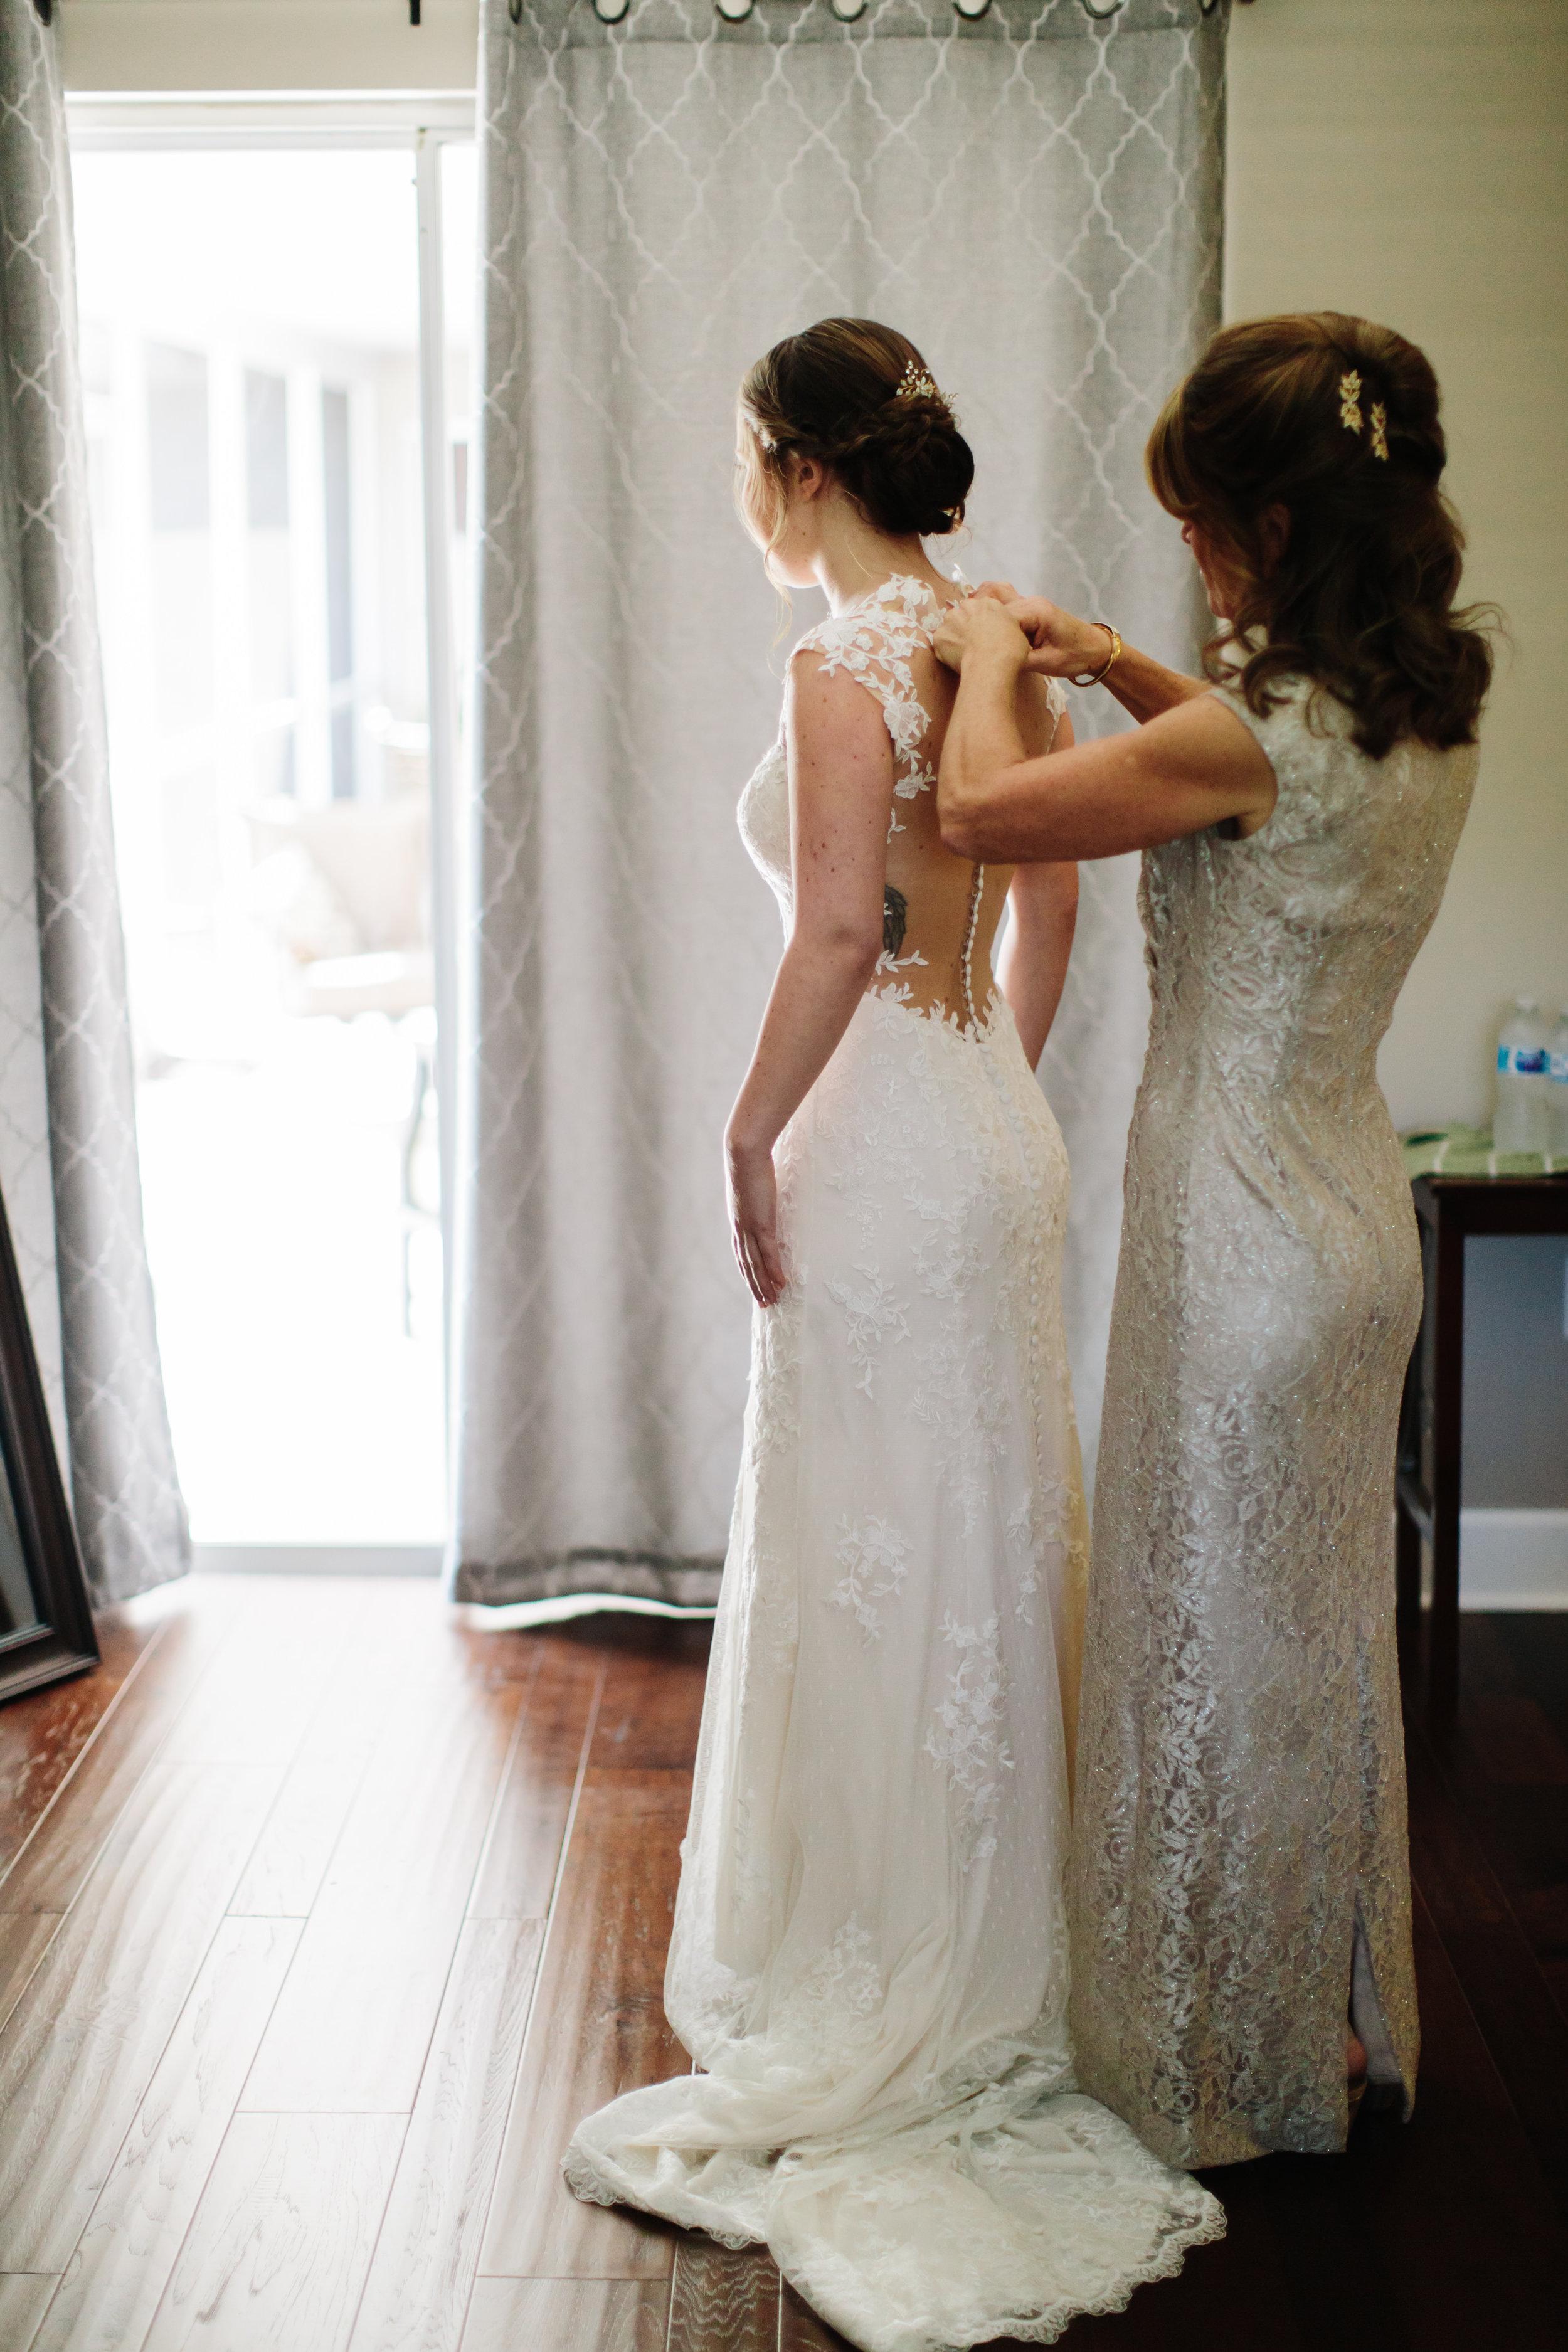 2018.02.17 Whitney and Joe Meyer Melbourne Wedding (51 of 890).jpg